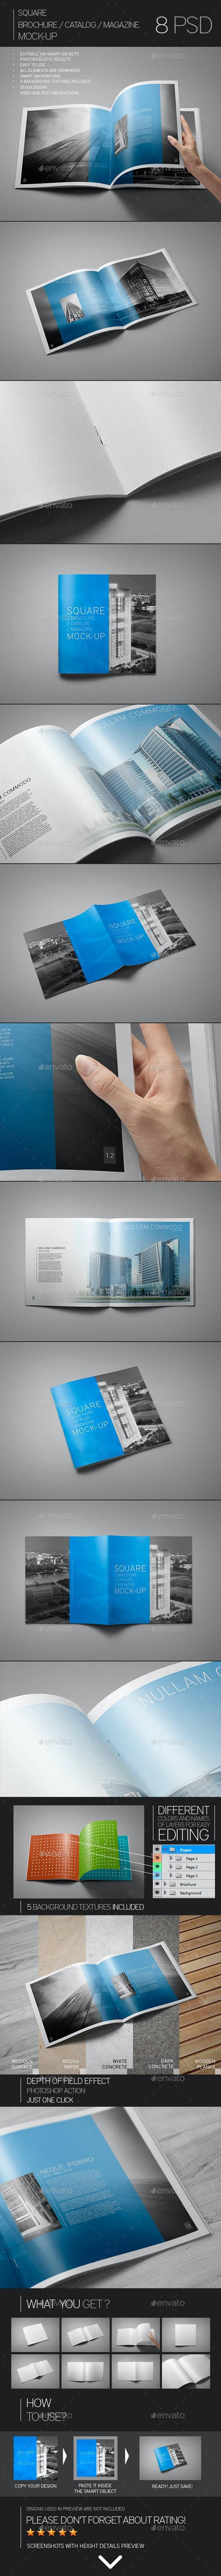 Square Brochure / Catalog / Magazine Mock-Up - Brochures Print